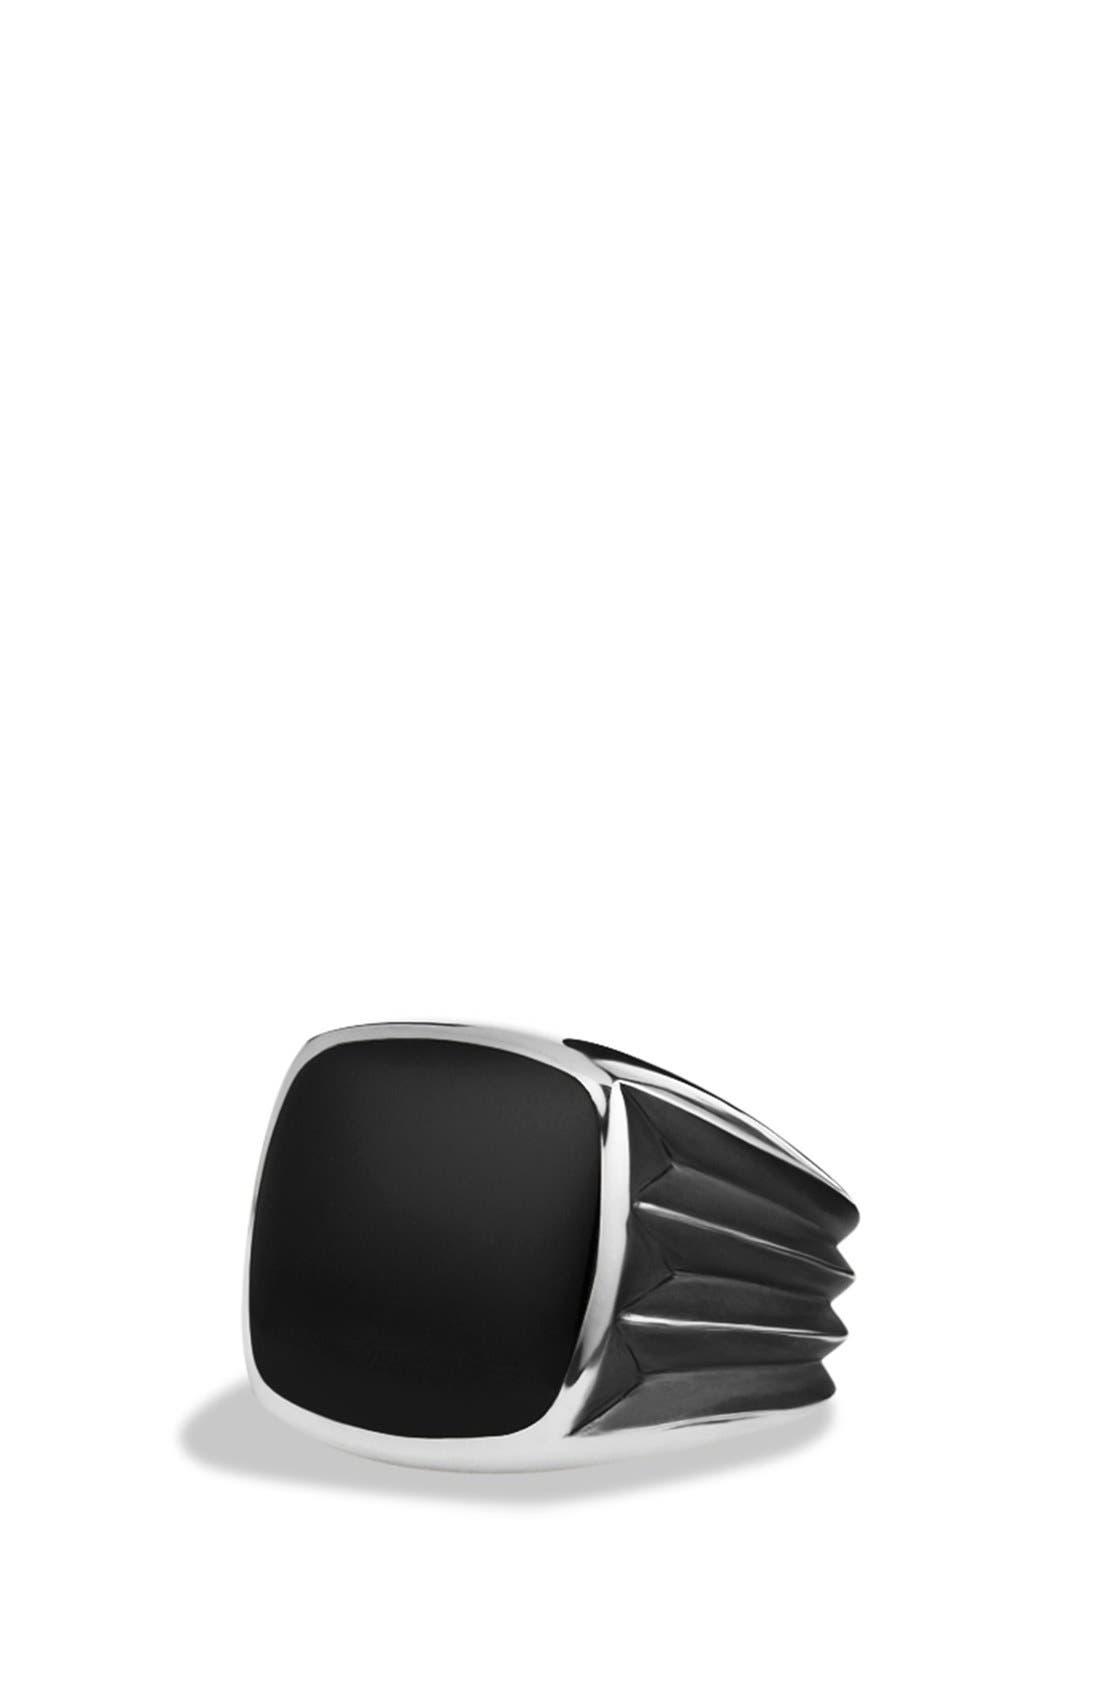 'Royal Cord' Knife Edge Signet Ring with Black Onyx,                             Main thumbnail 1, color,                             Black Onyx